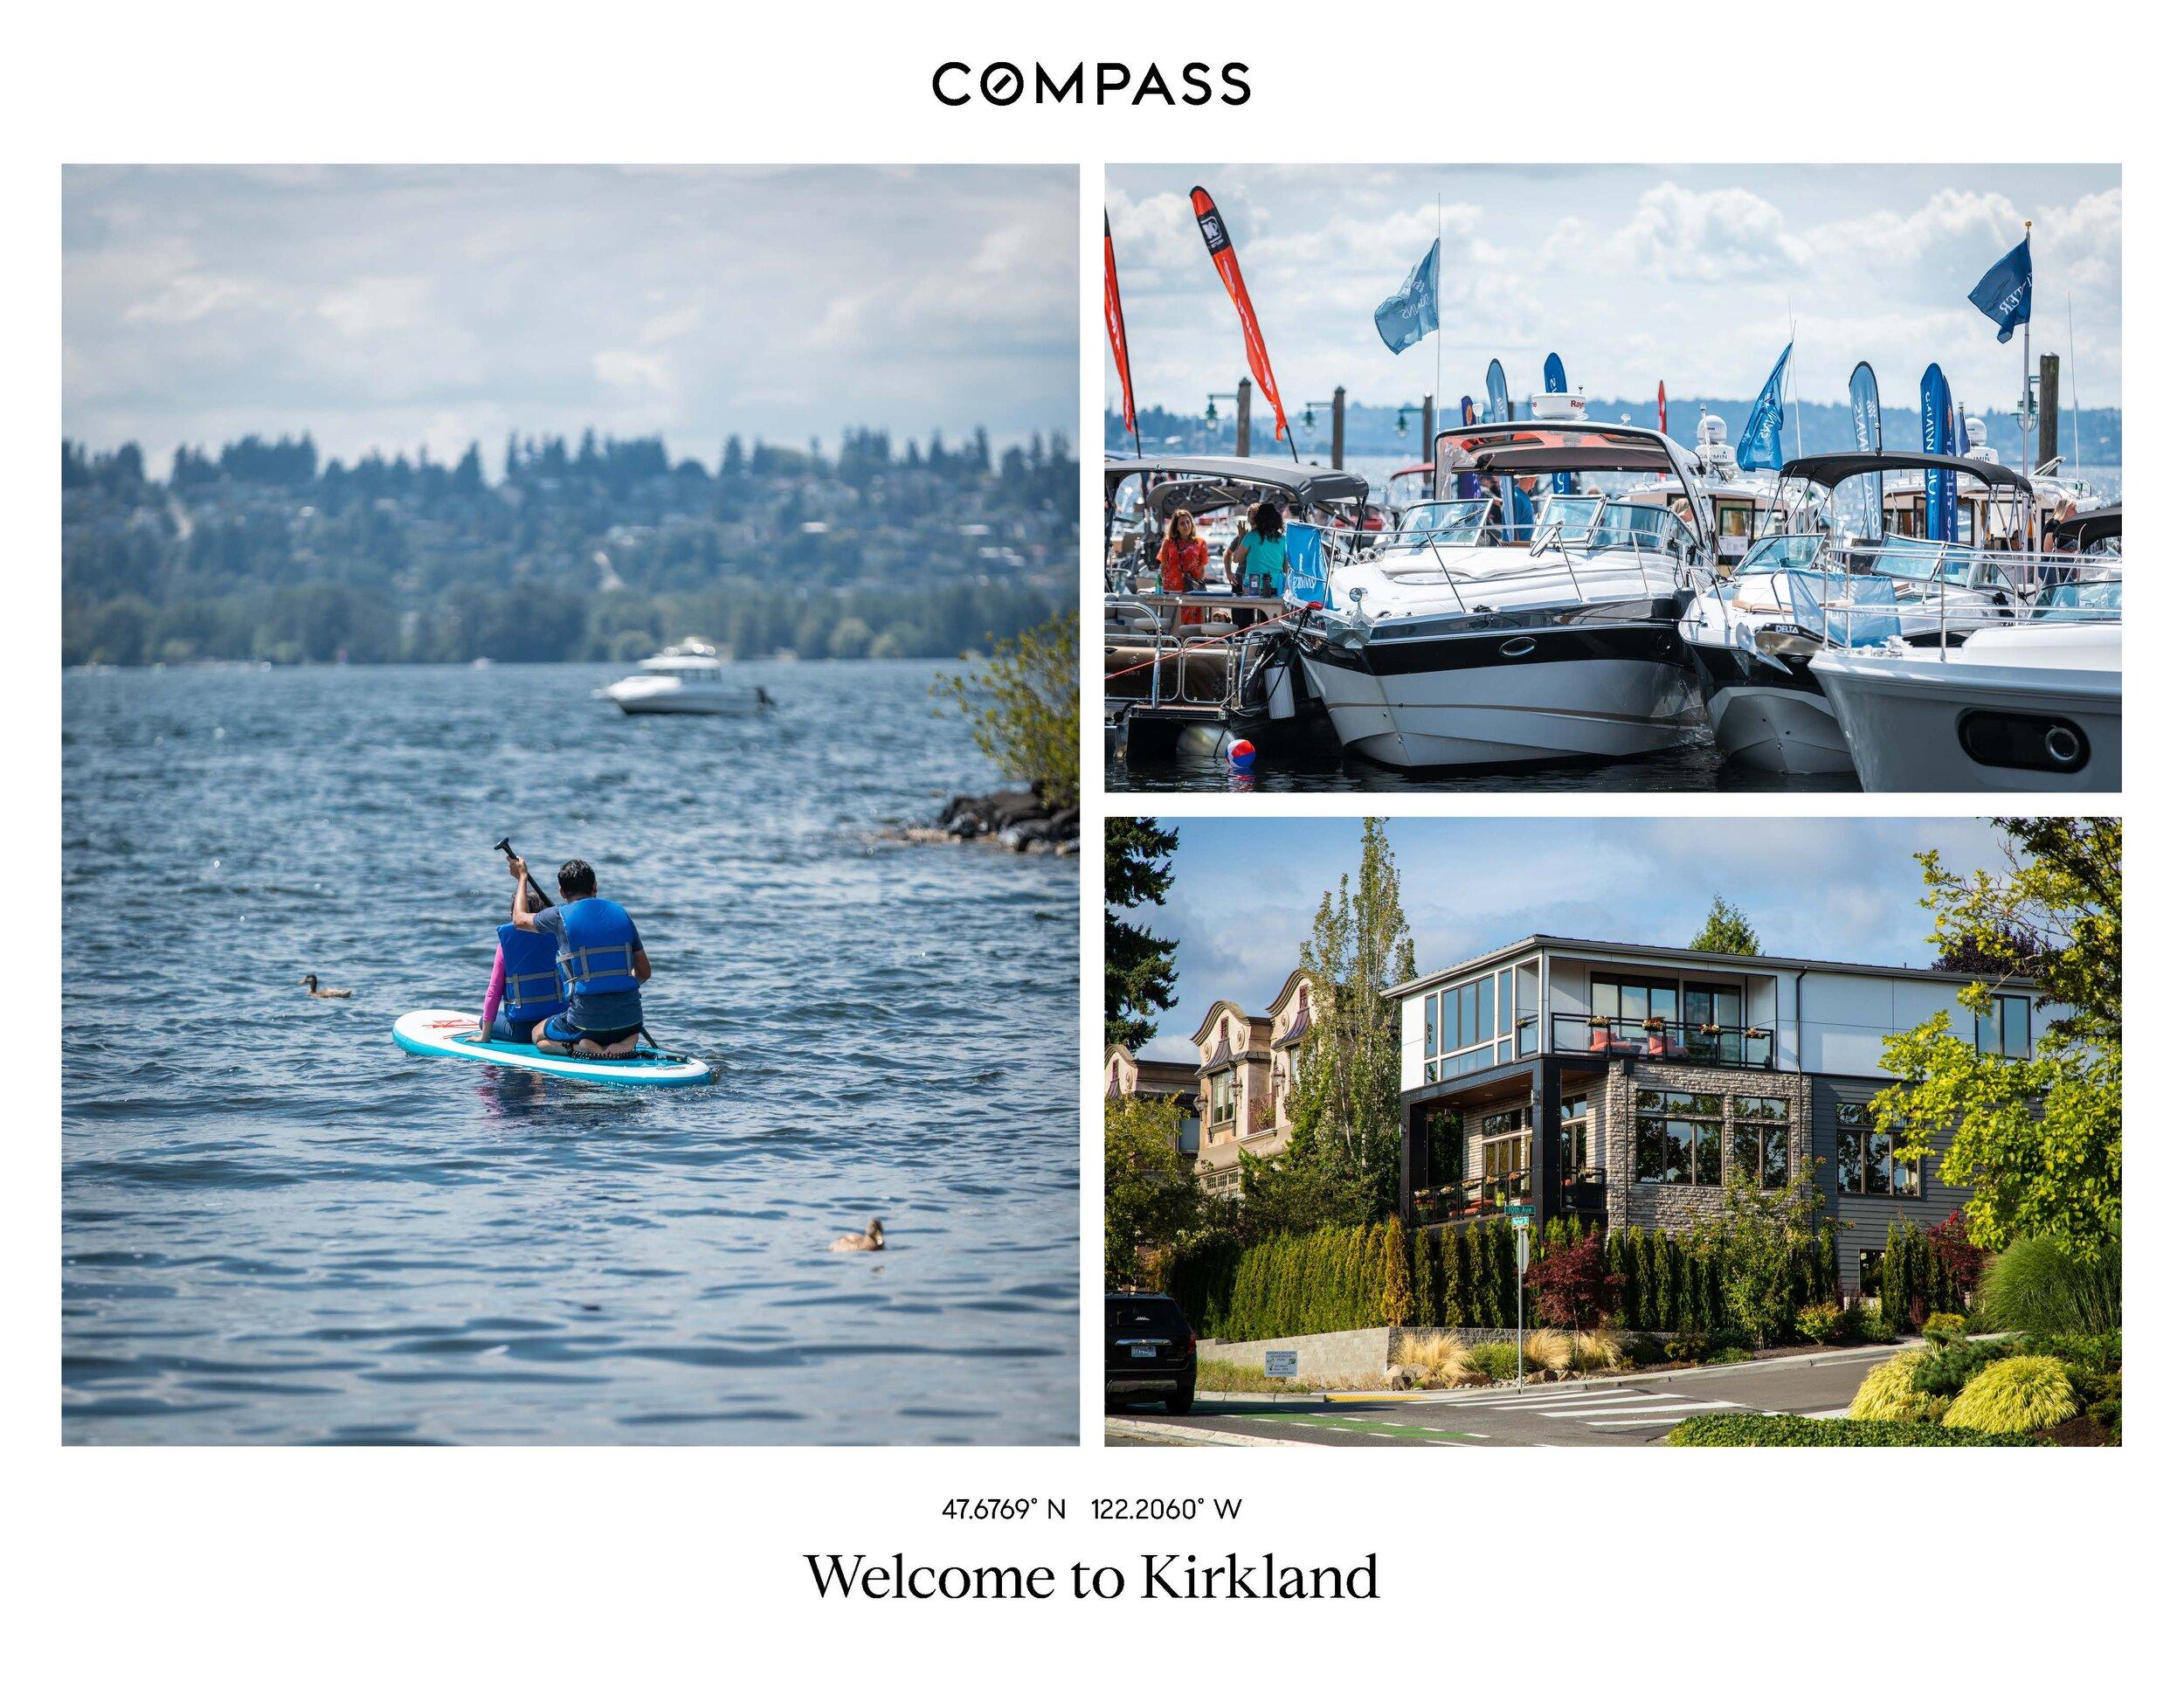 marketing-center_Copy-of-Kirkland-Community-guide-2019.09.12-09.07.59.jpg